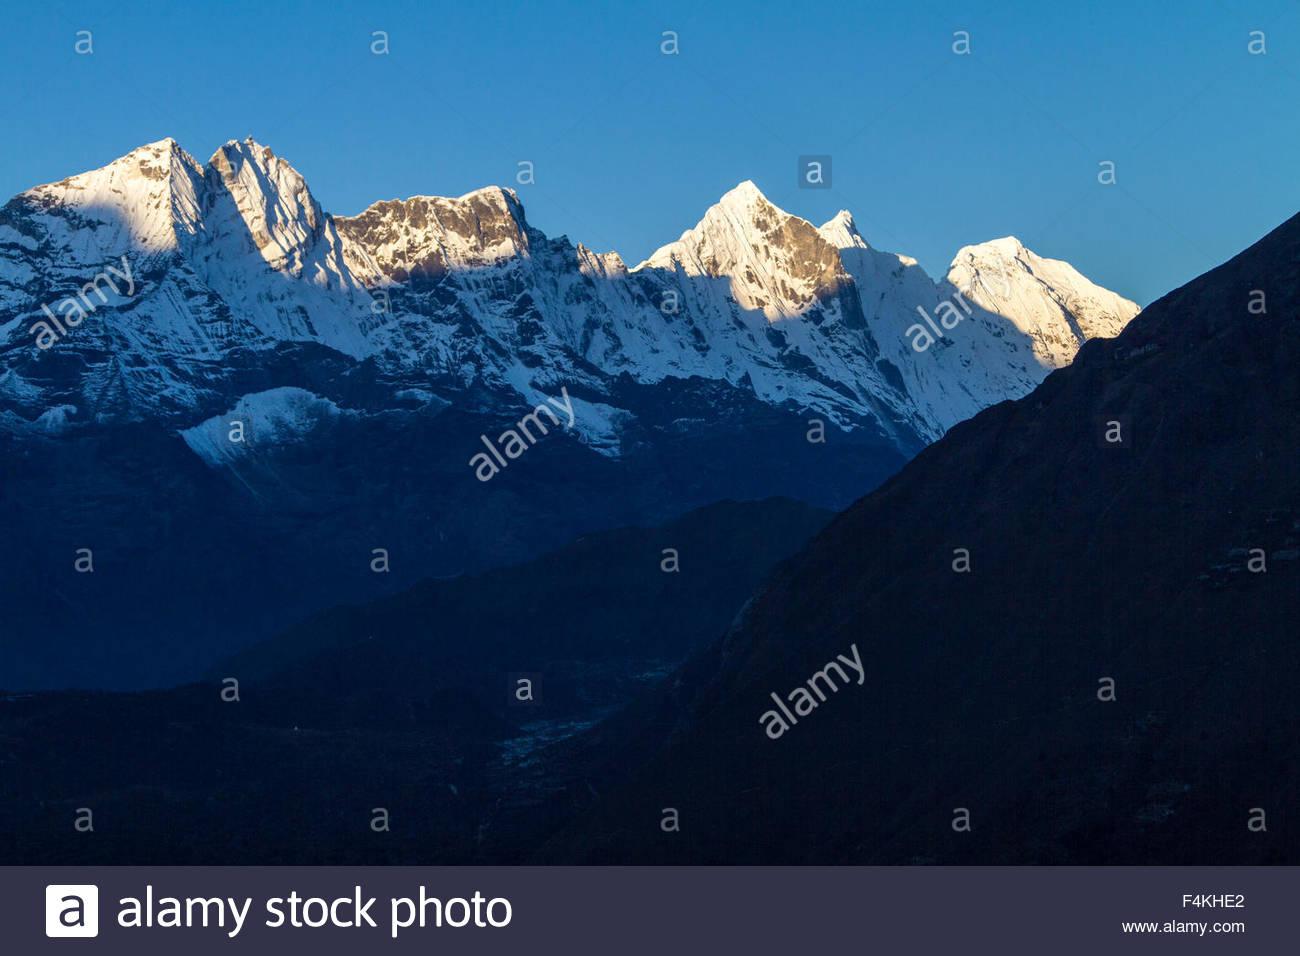 Stark Himalaya Mountains float majestically above the landscape - Stock Image